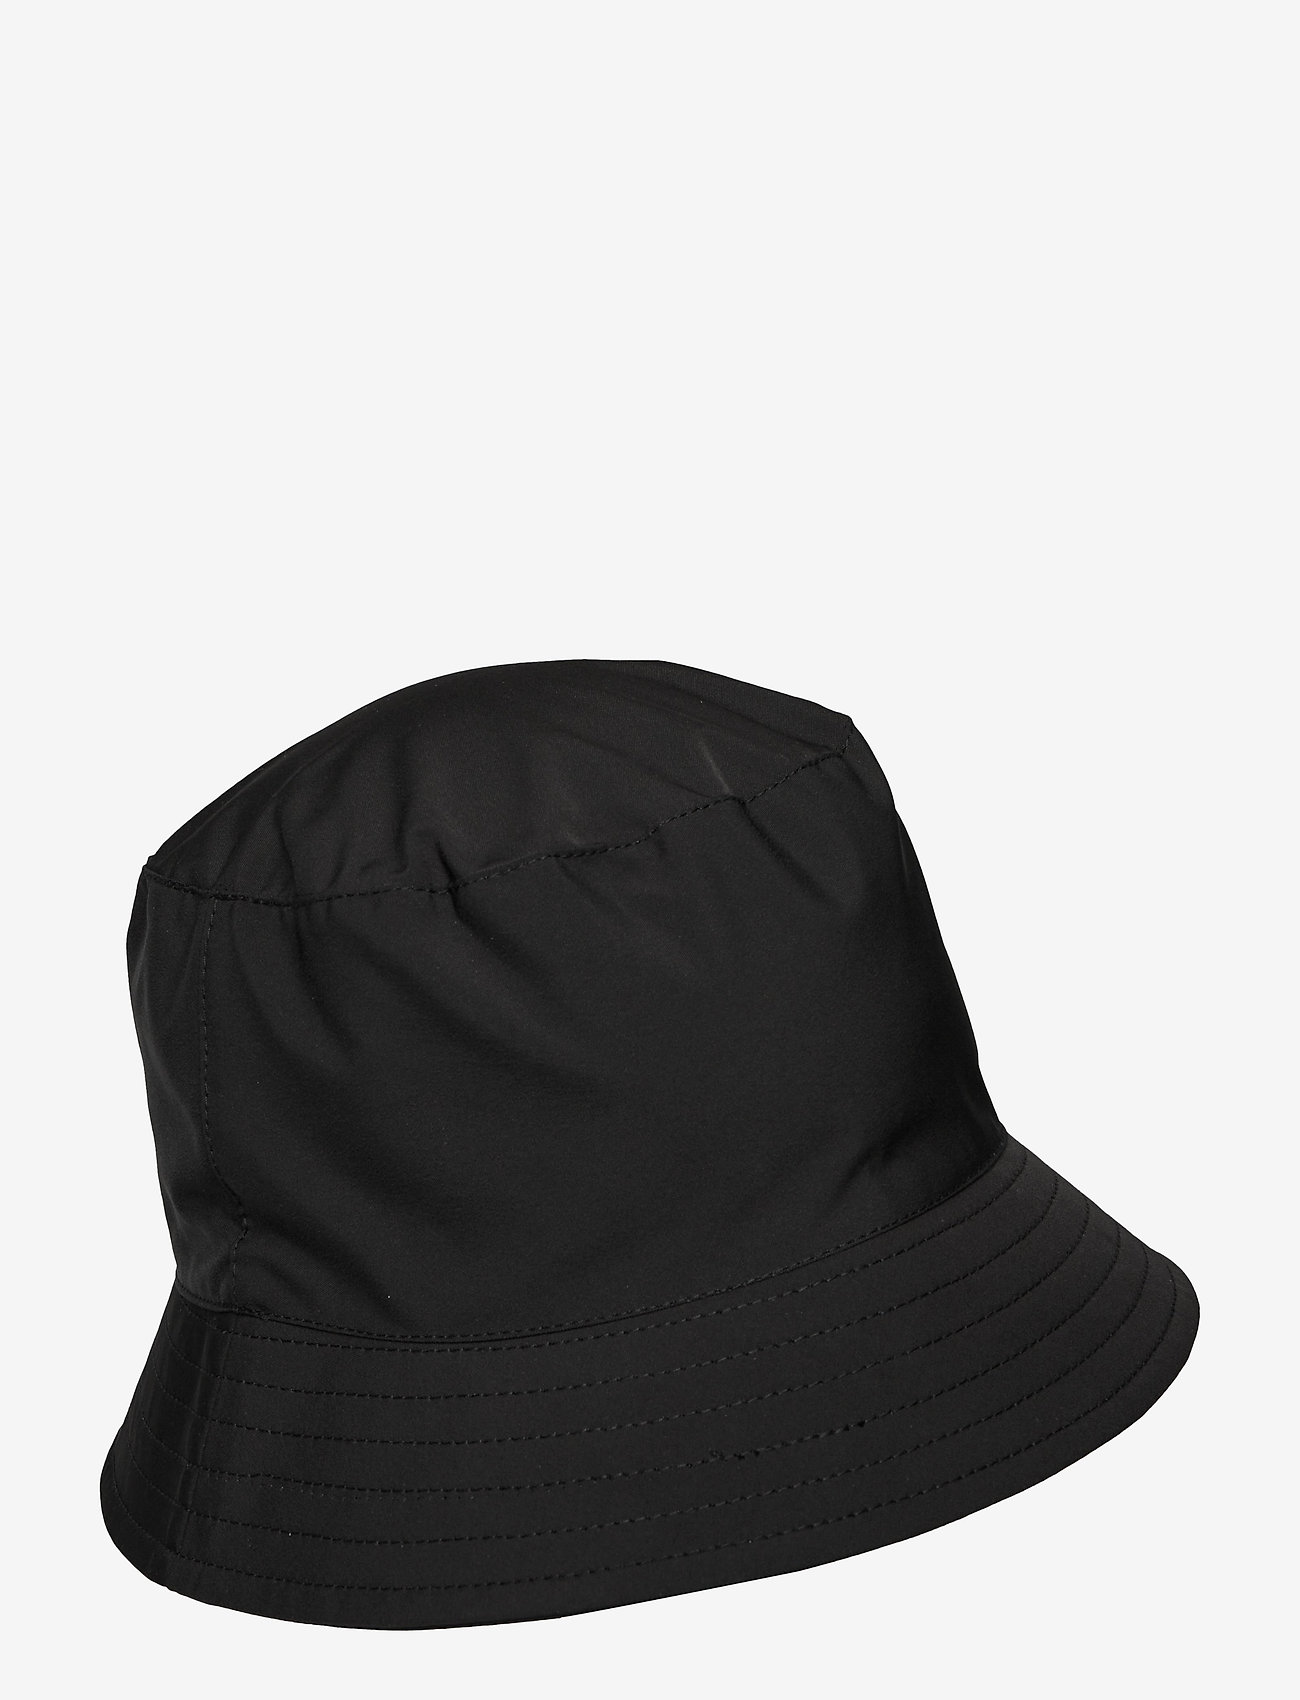 Pieces - PCTOMMA BUCKET HAT - bøllehatte - black - 0